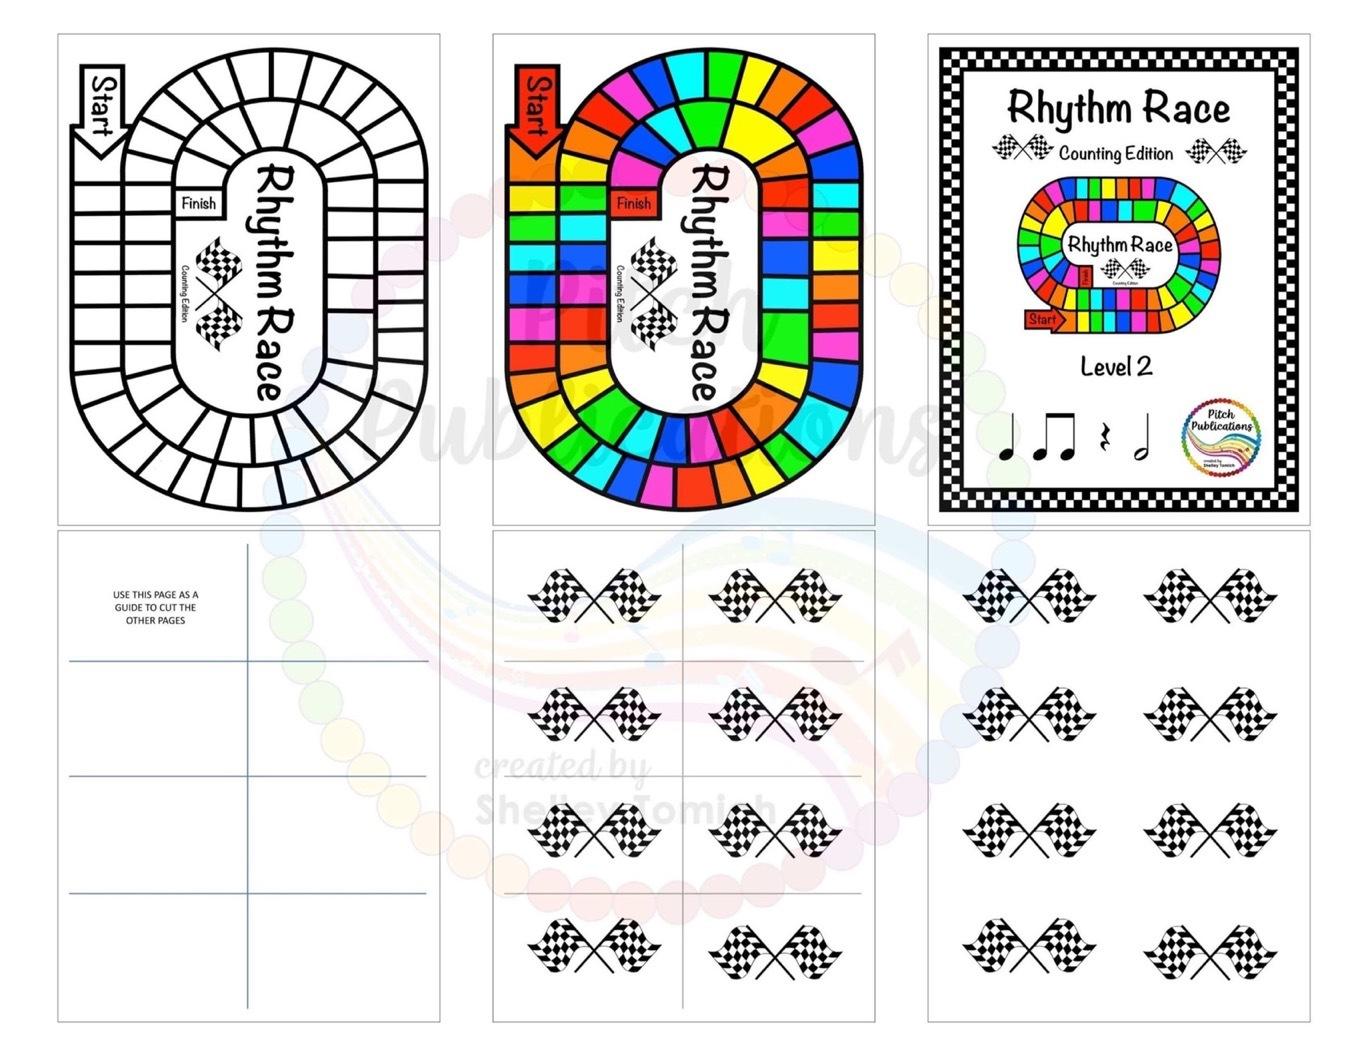 Music Centers: Rhythm Race Counting Edition Level 2 - Rhythm Game